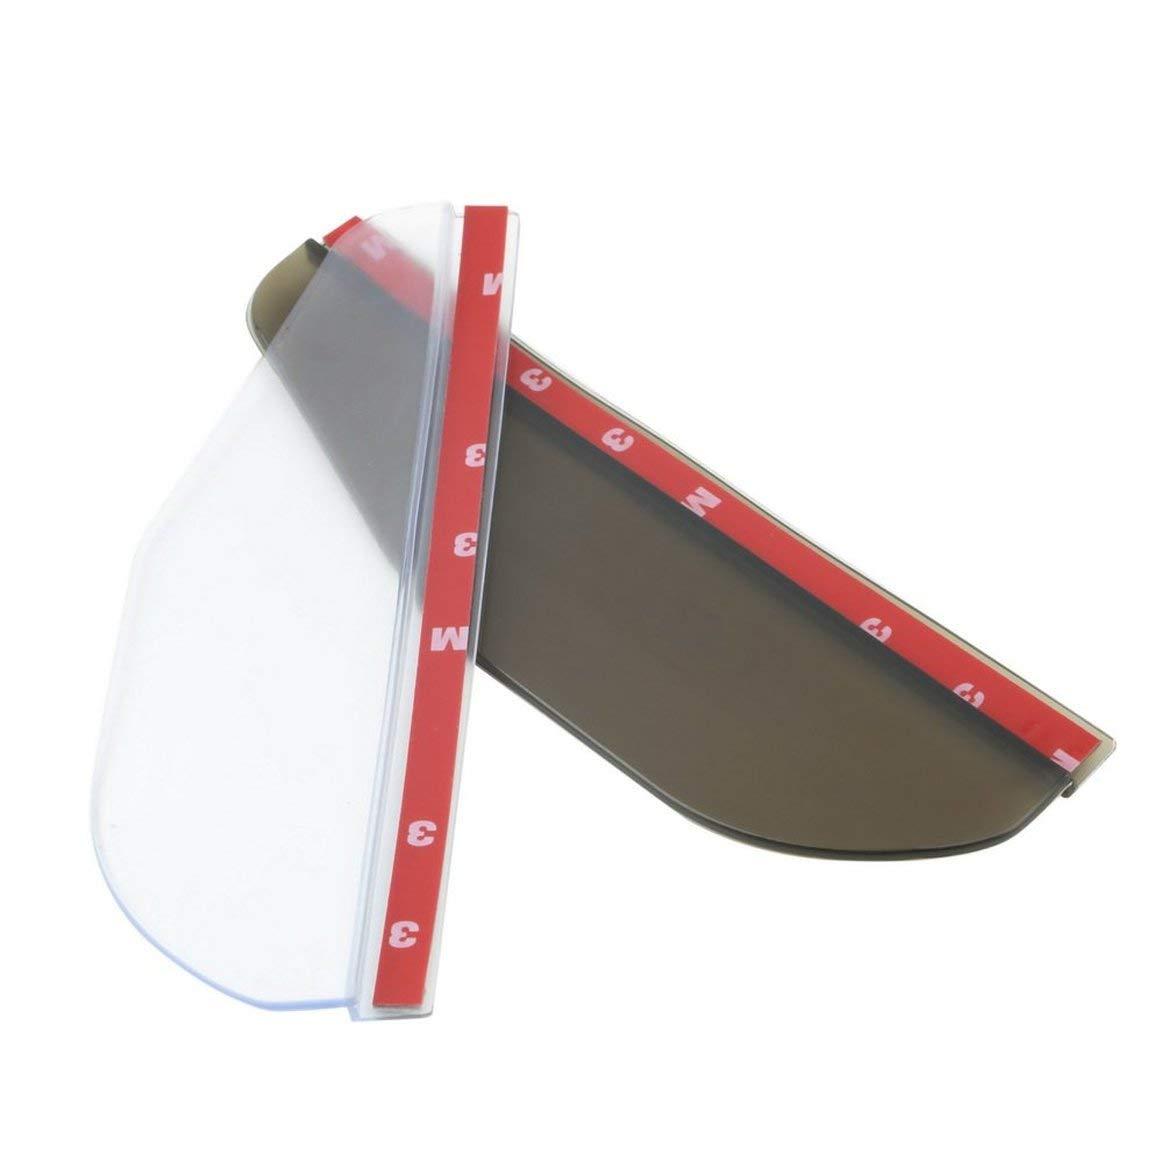 Kongqiabona 2Pcs//Set Car Rain Shield Flexible Rubber Rearview Mirror Rain Shade Water Guard Shower Blocker Cover Sun Visor Shade